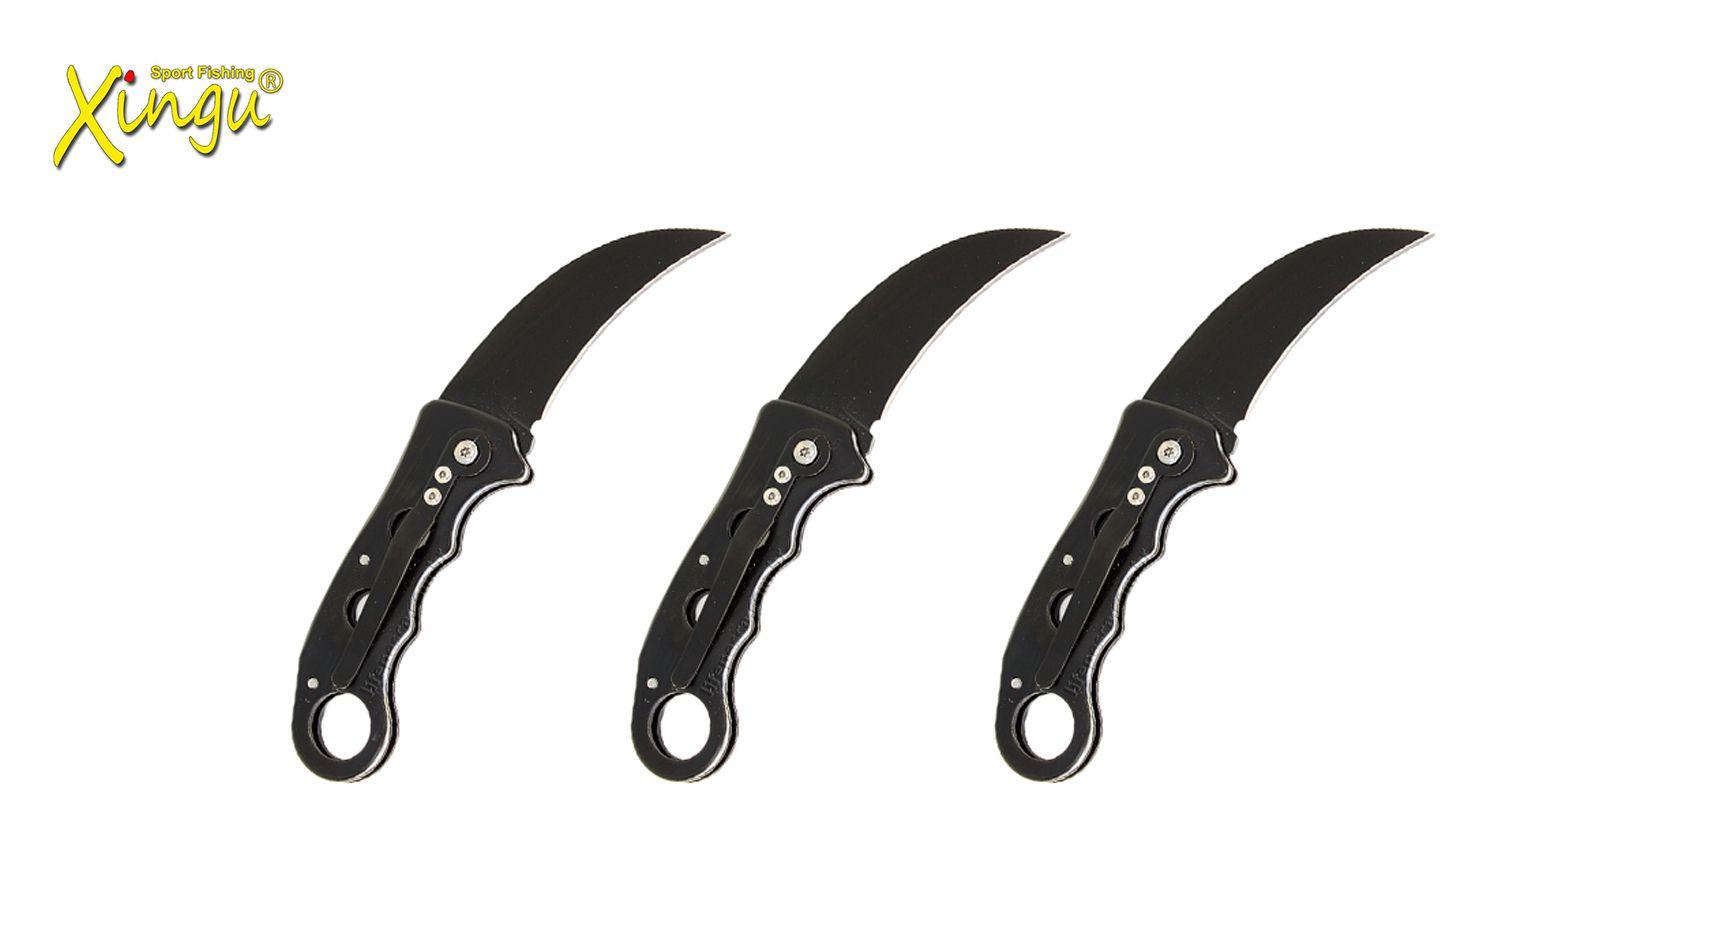 Kit 3 Canivetes Xingu XV3138 Lâmina Curva - Aço Carbono